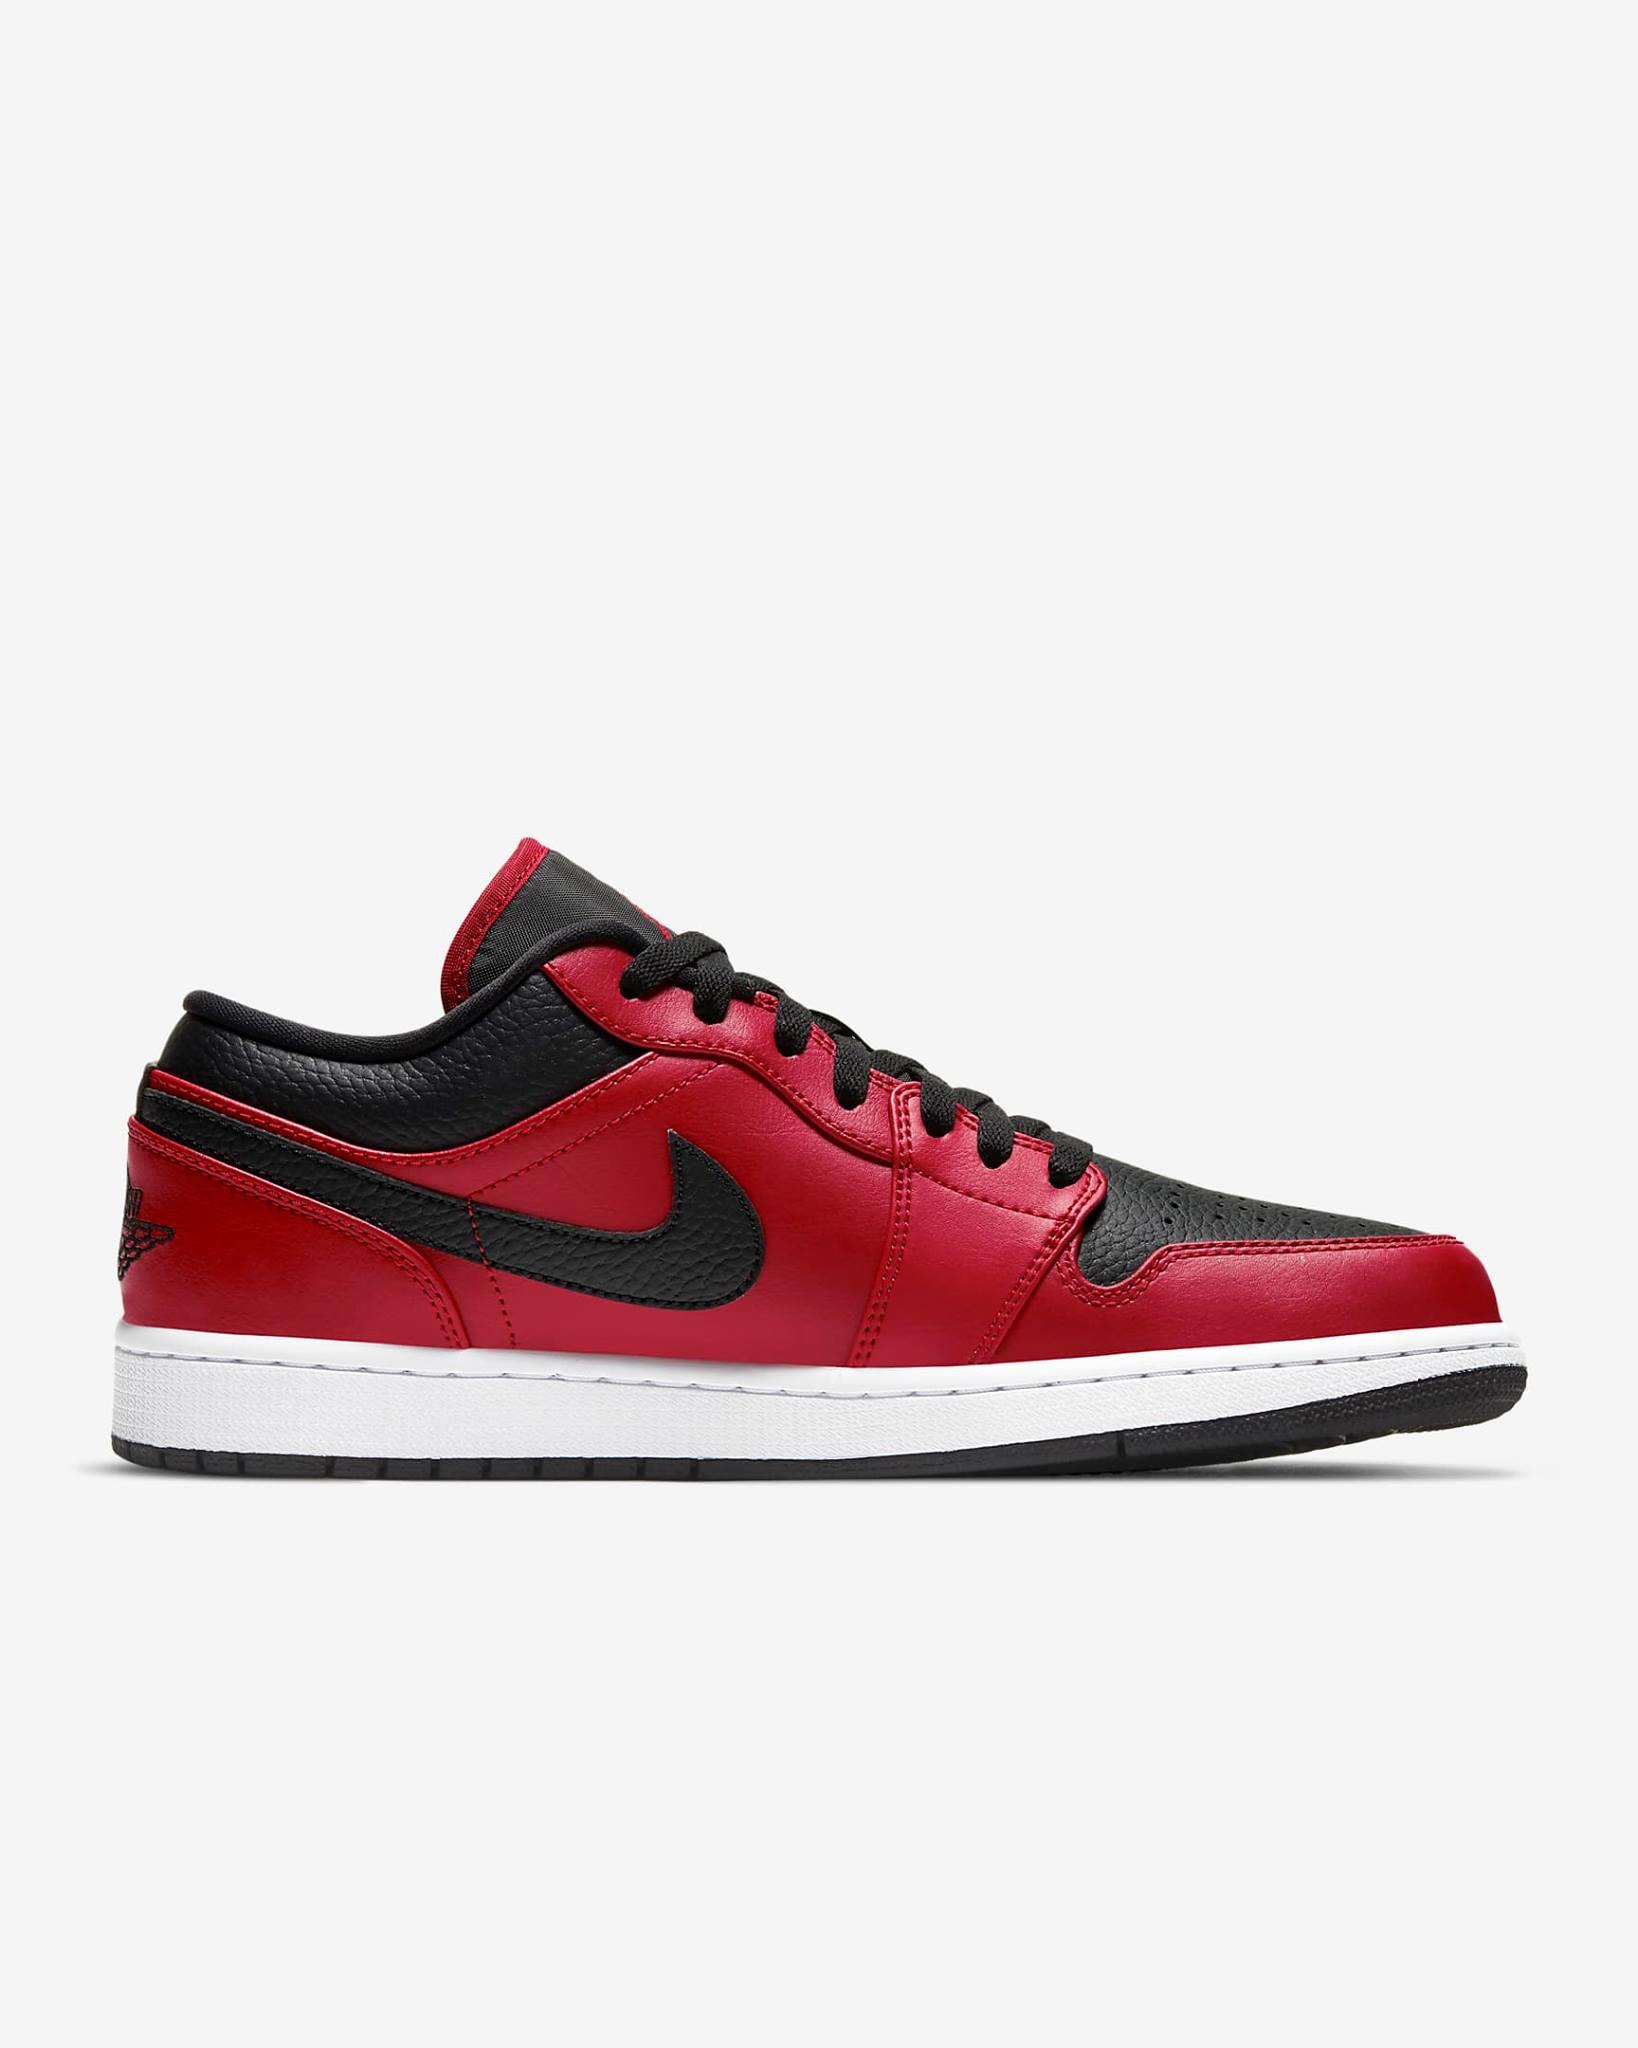 giay-sneaker-nam-nike-air-jordan-1-low-553558-605-reverse-bred-hang-chinh-hang